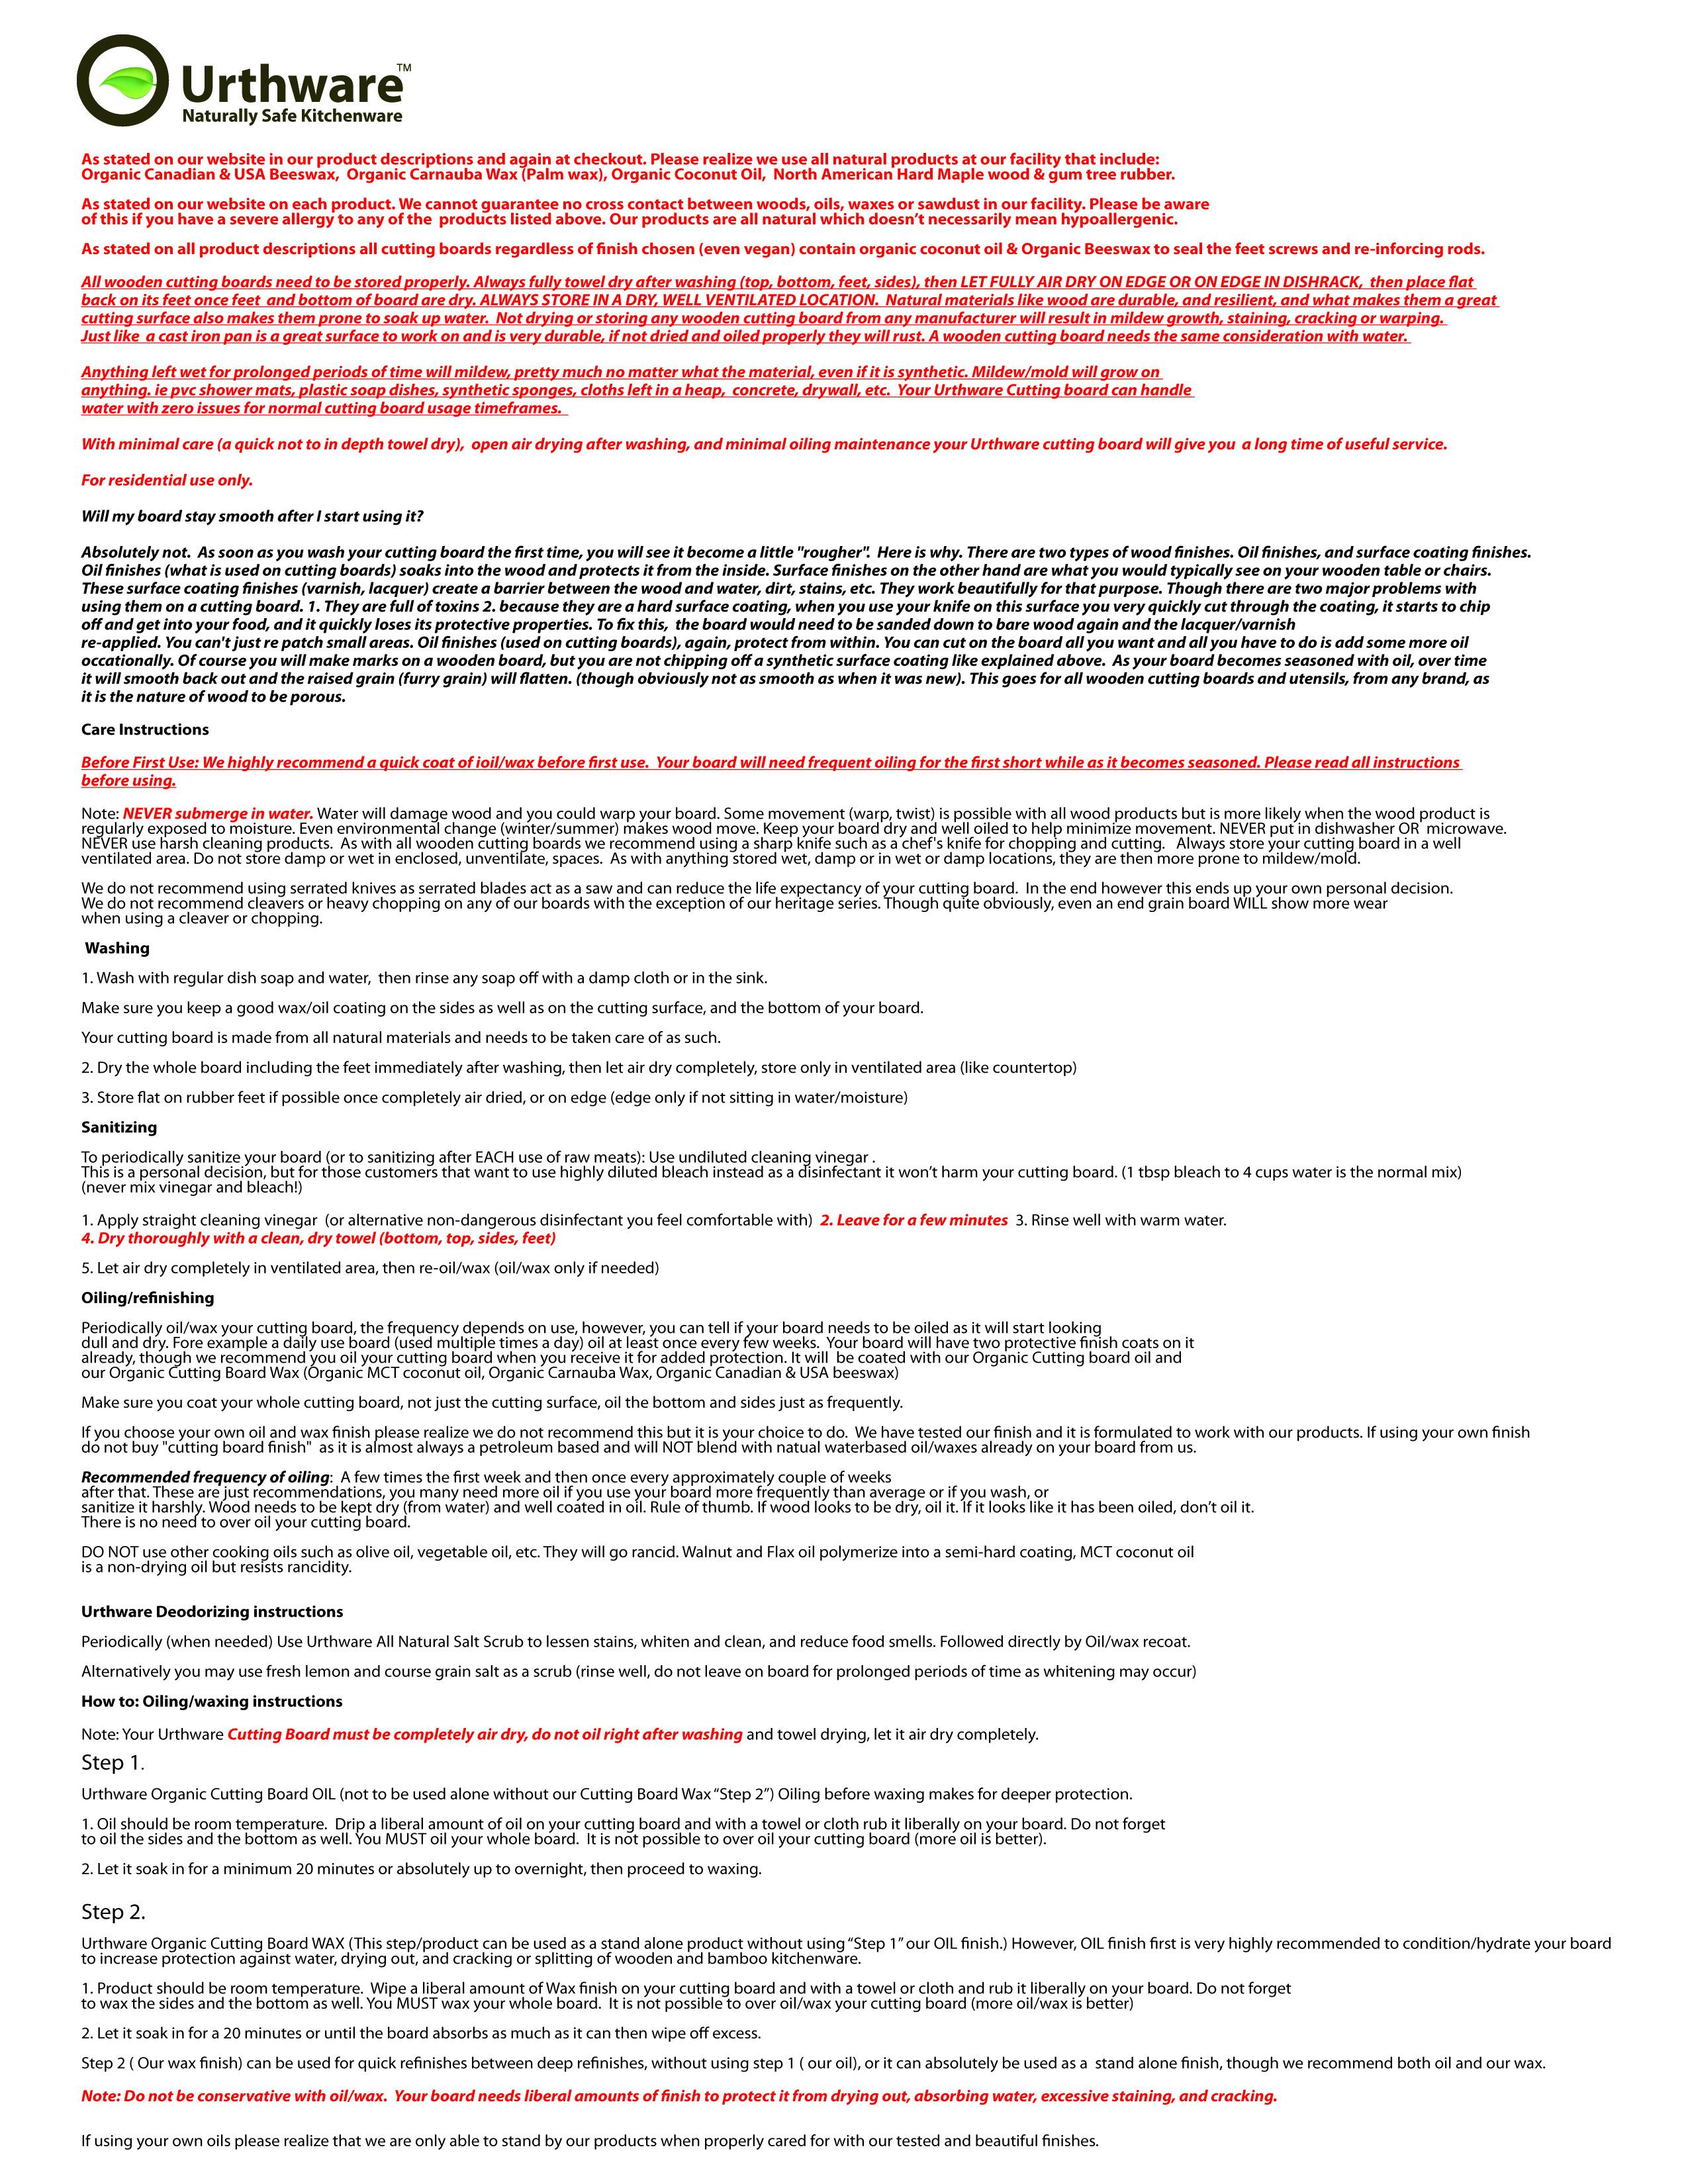 urthware-care-instructions-2020-download.jpg